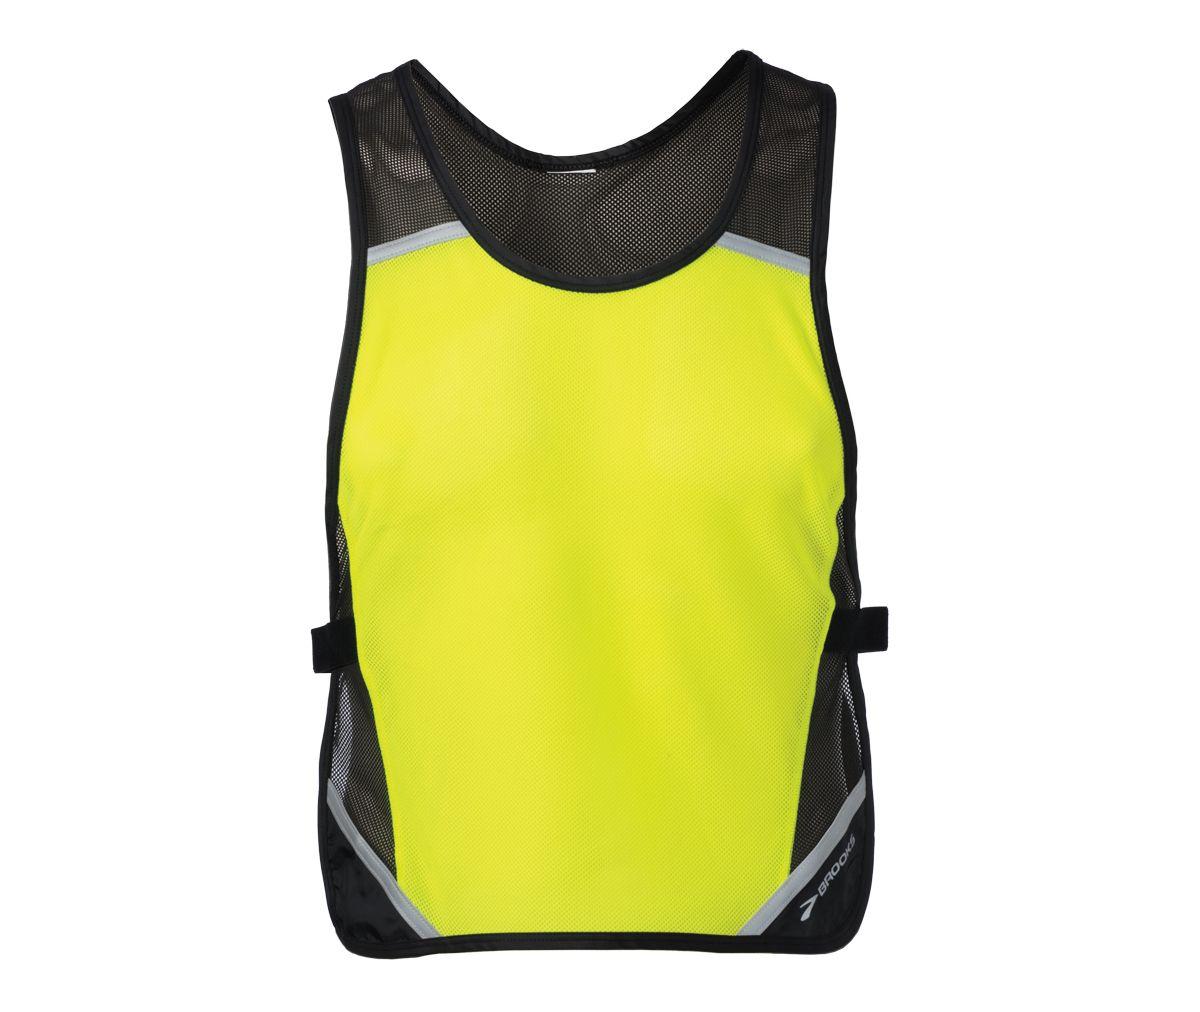 asics reflective vest womens – Walk to Remember